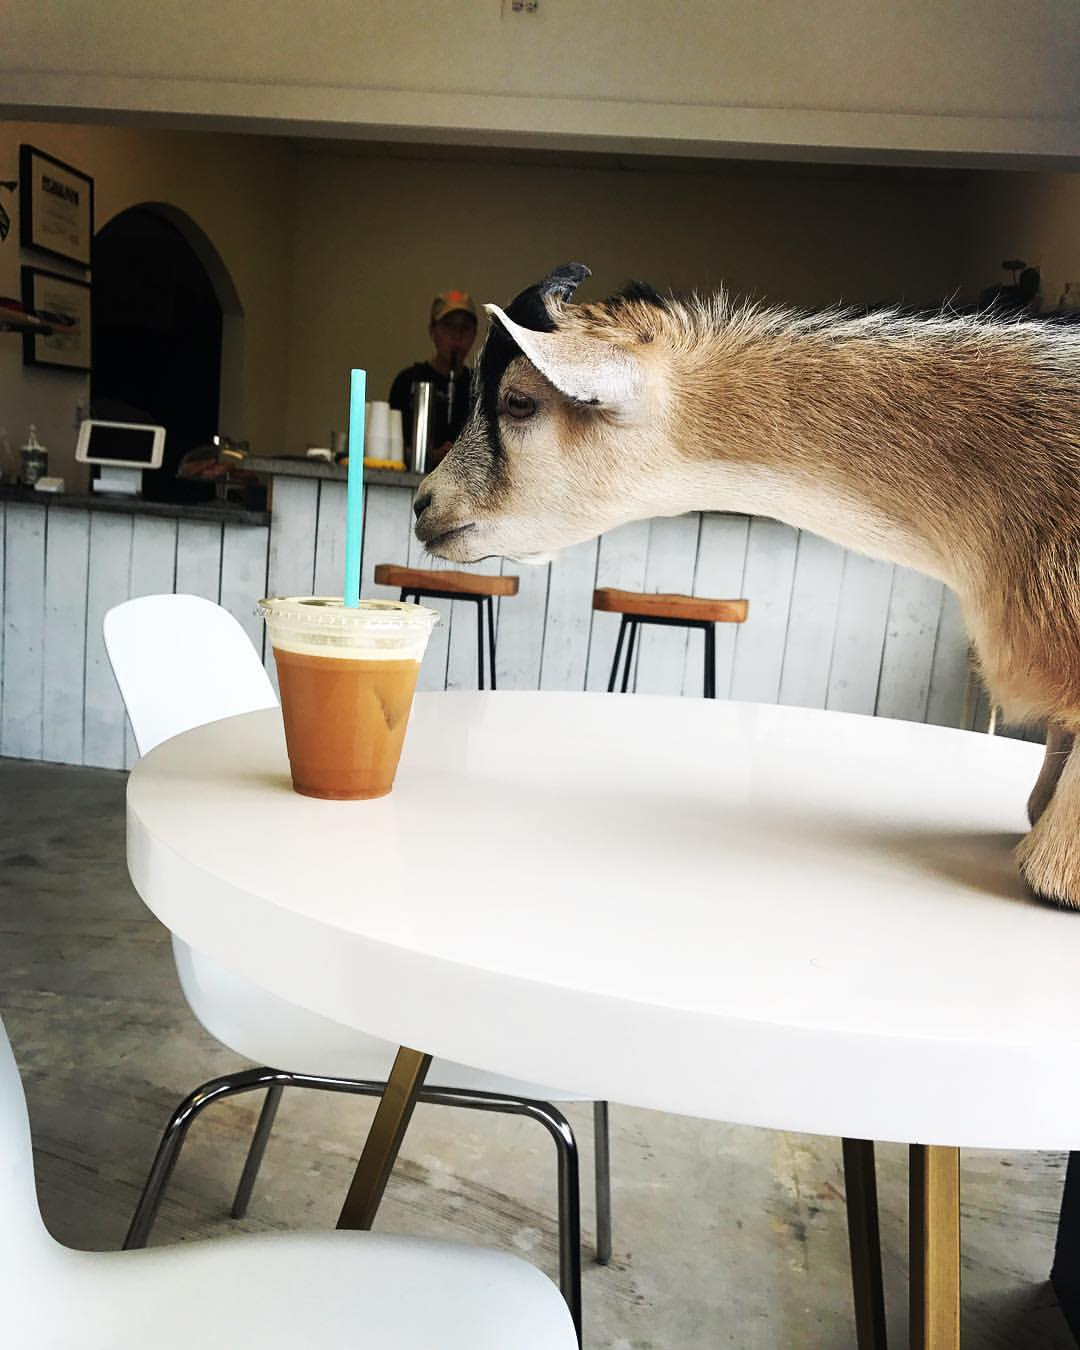 Civil Goat Coffee Co.'s mascot Butters